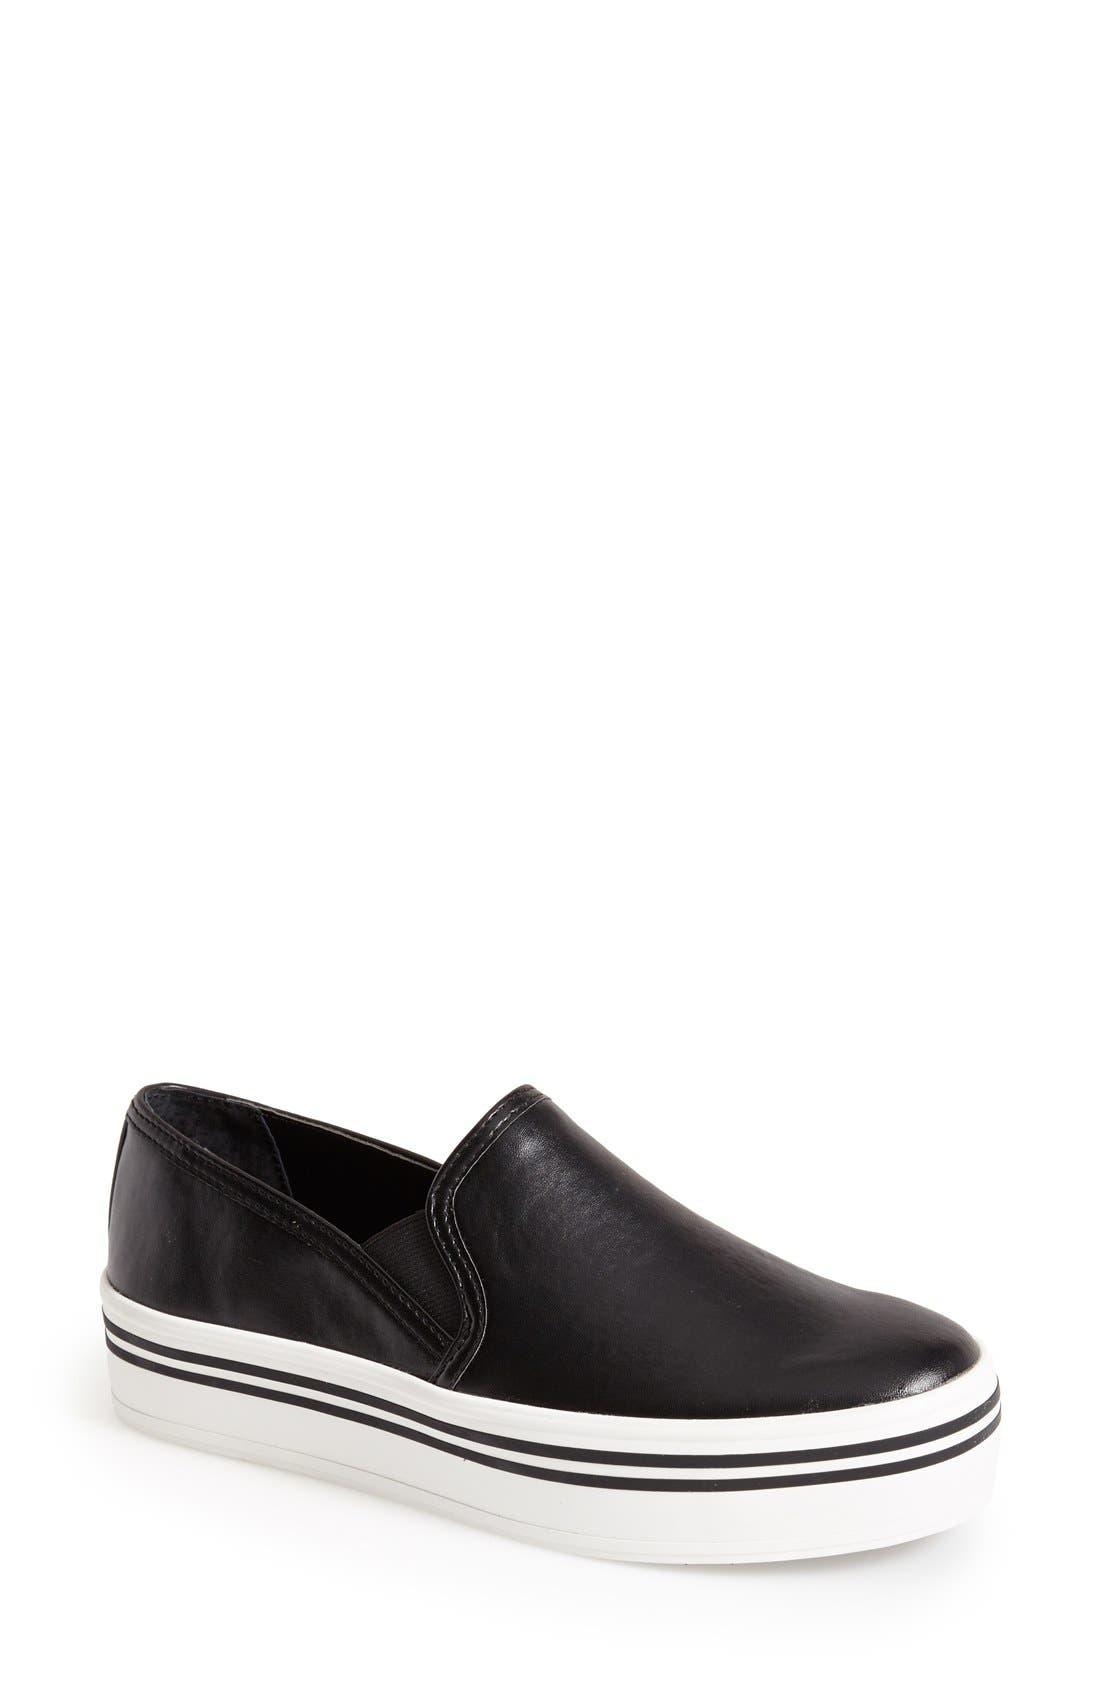 Main Image - DV by Dolce Vita 'Jinsy' Slip-On Sneaker (Women)